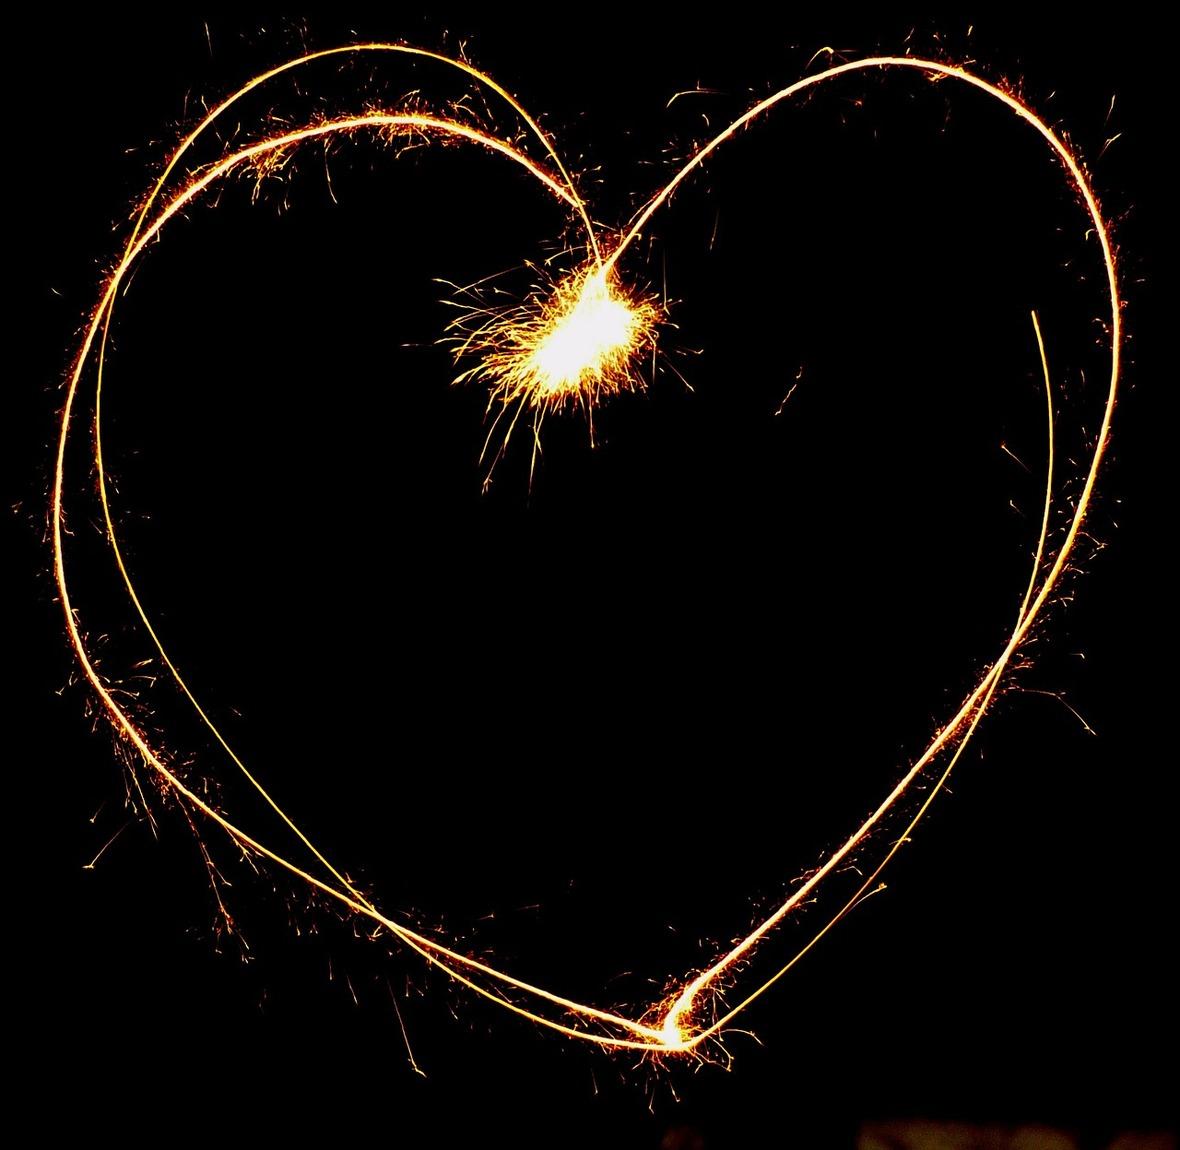 heart-588259 1280